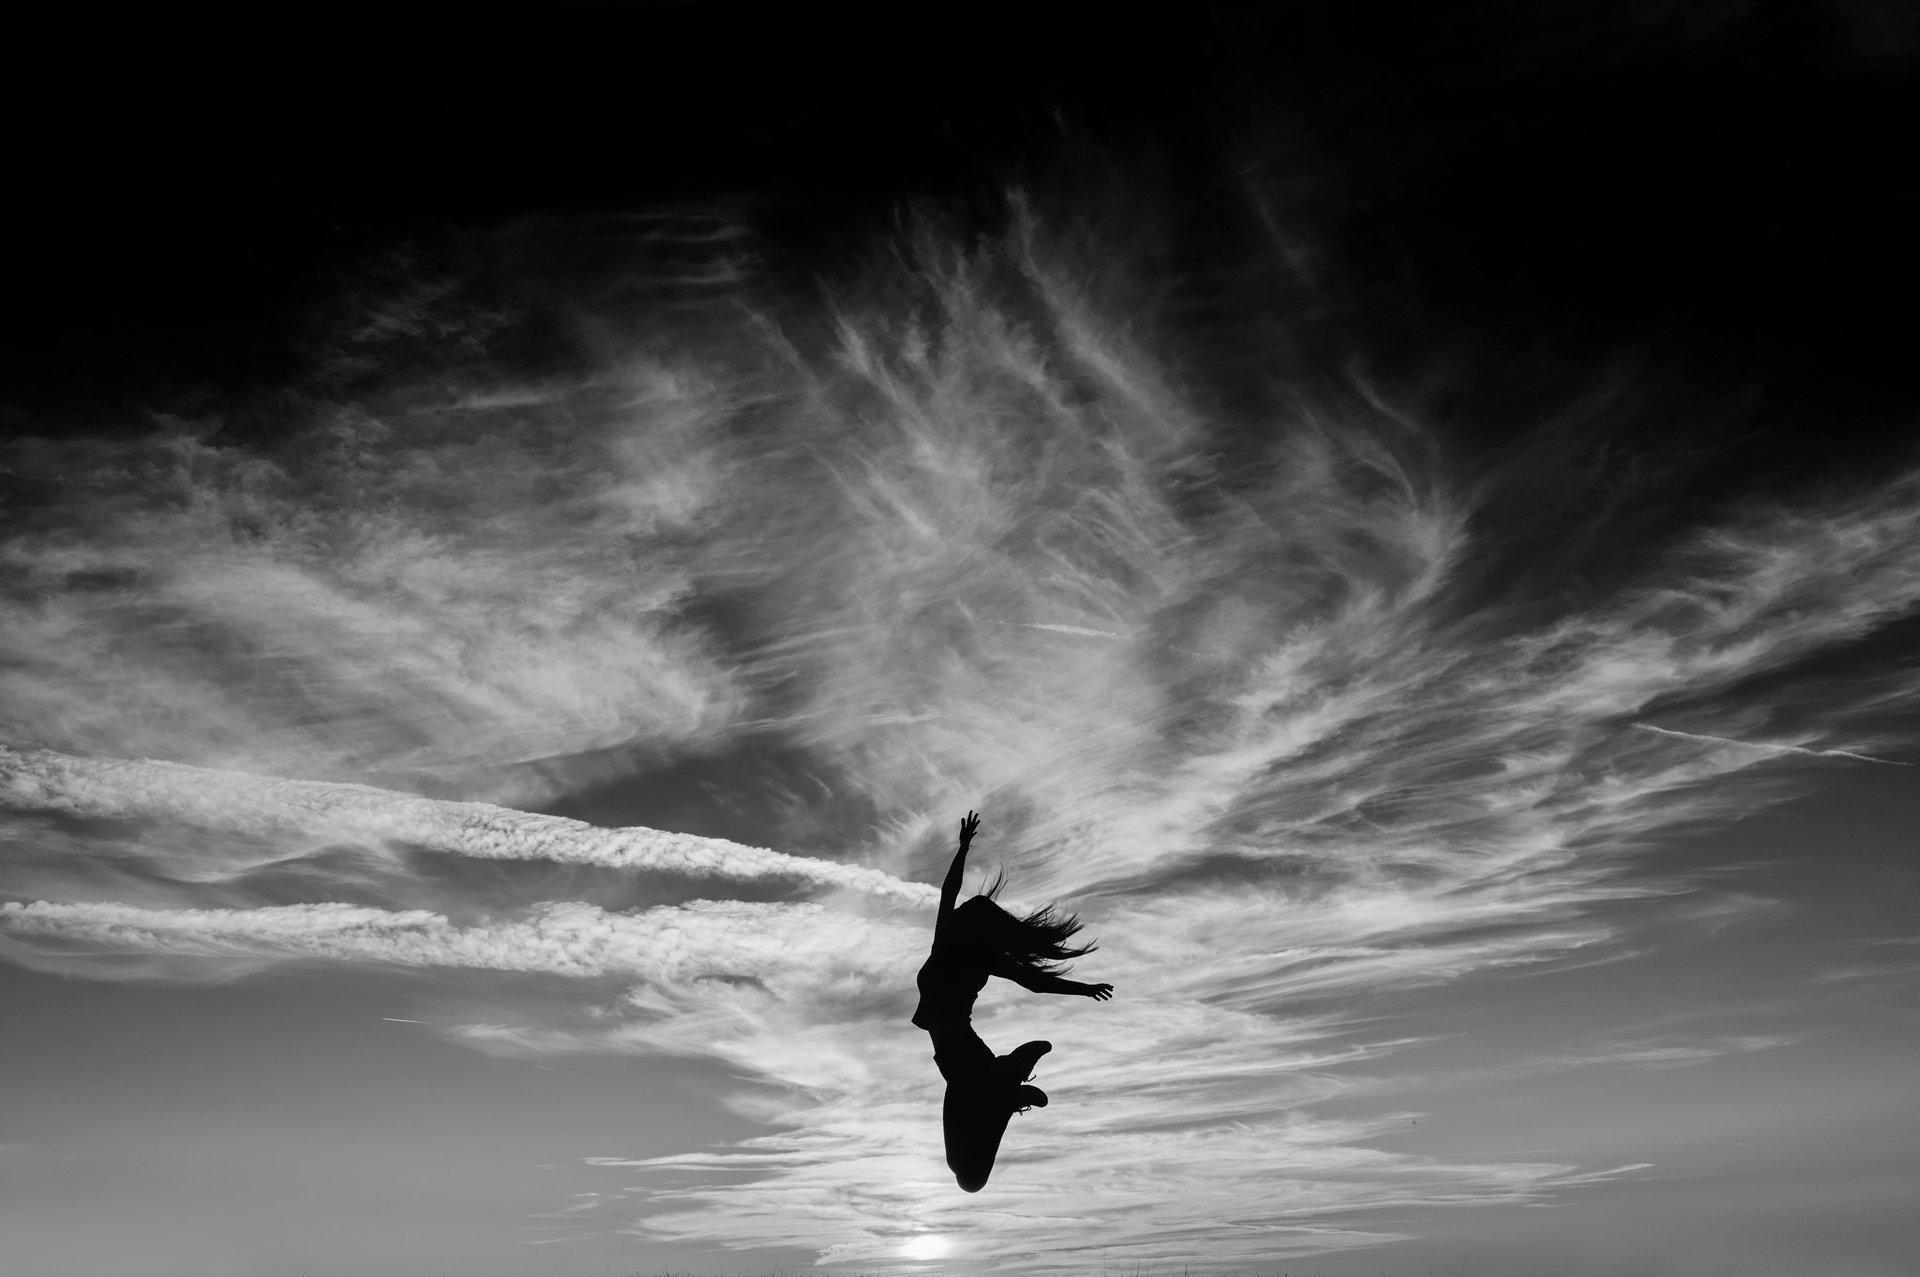 Photo in Emotions | Author Pencho Chukov - chukov | PHOTO FORUM